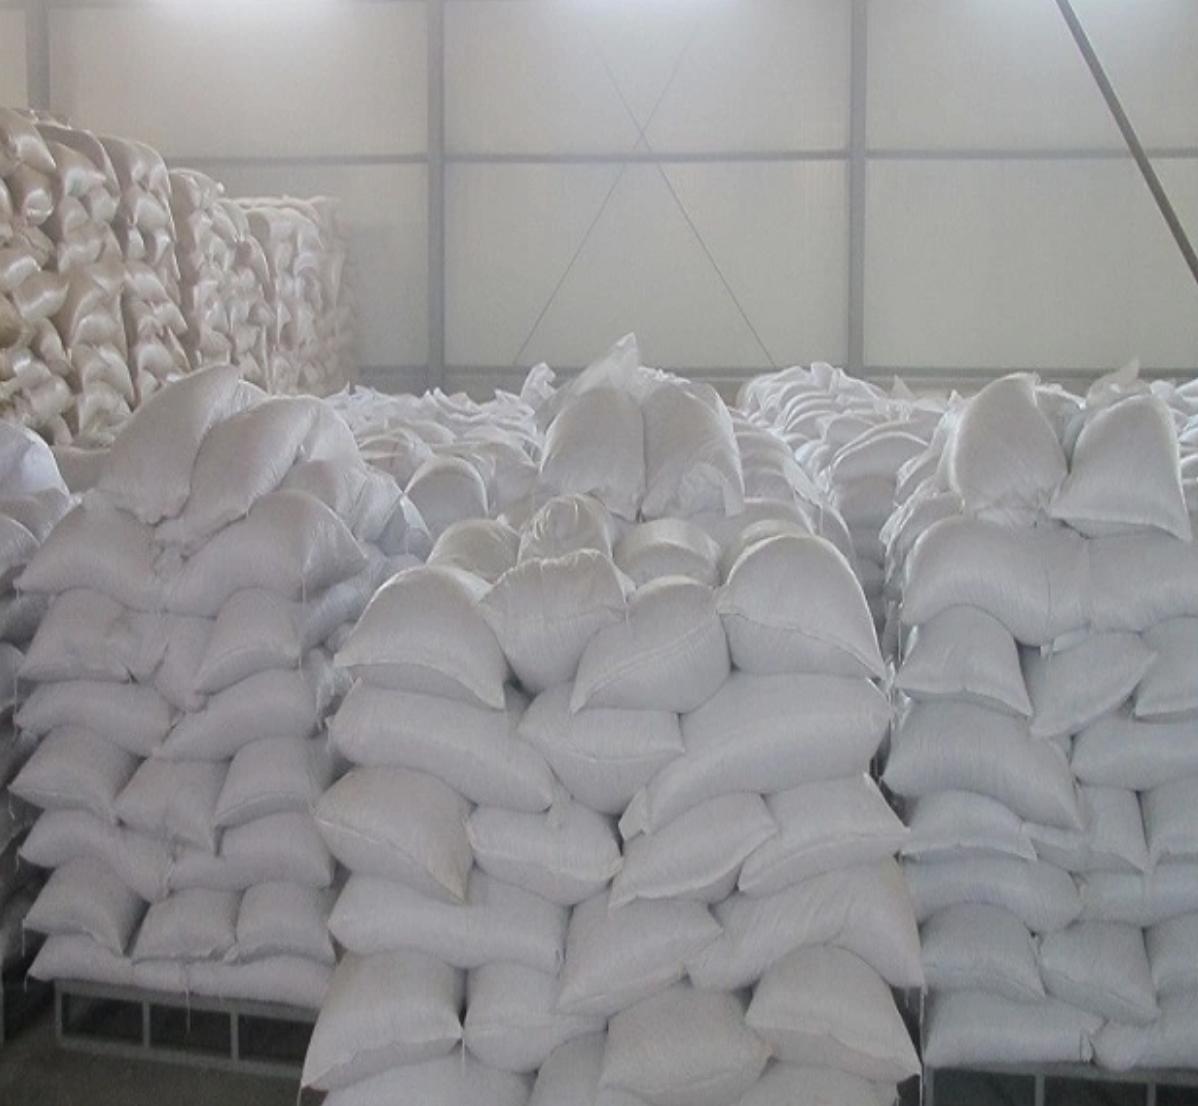 Best Quality White Suger, Brown Sugar, Raw sugar for sale Refined White Sugar Powder Refined Sugar ICUMSA 45